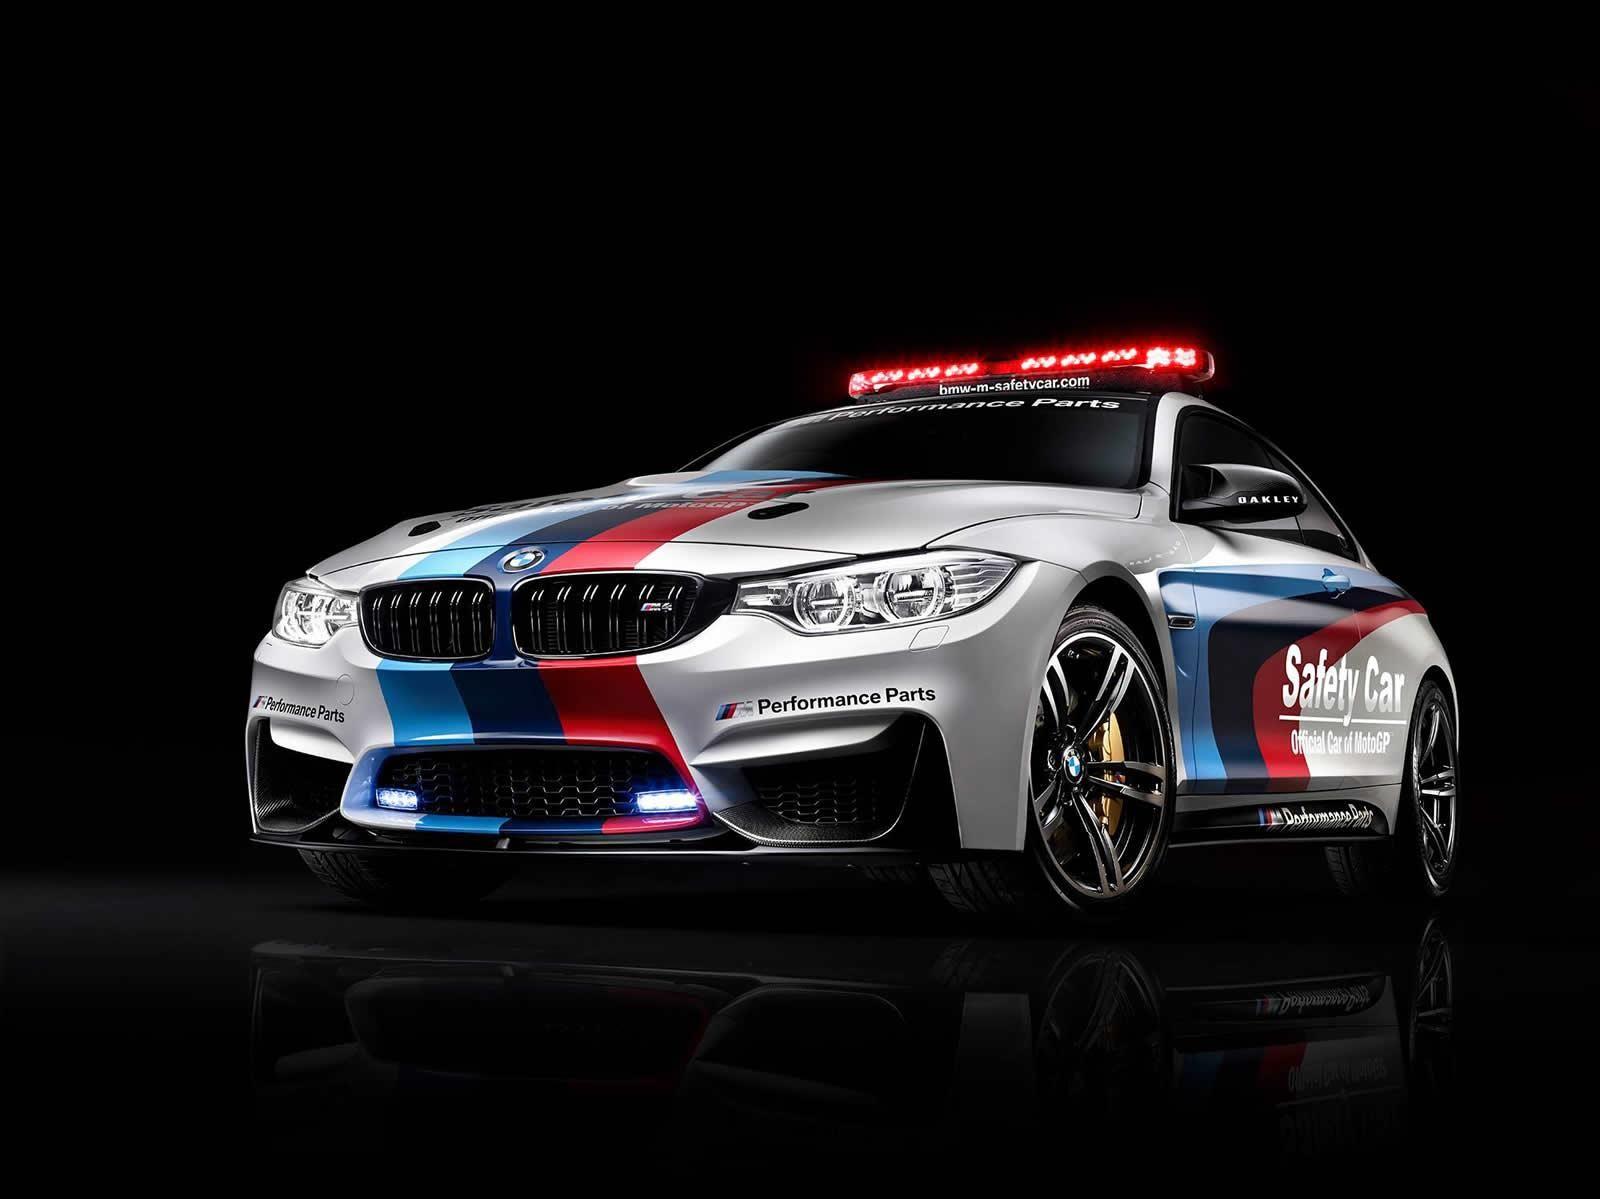 BMW M4 Moto GP Safety Car Google 검색 Coches bmw, Bmw m4